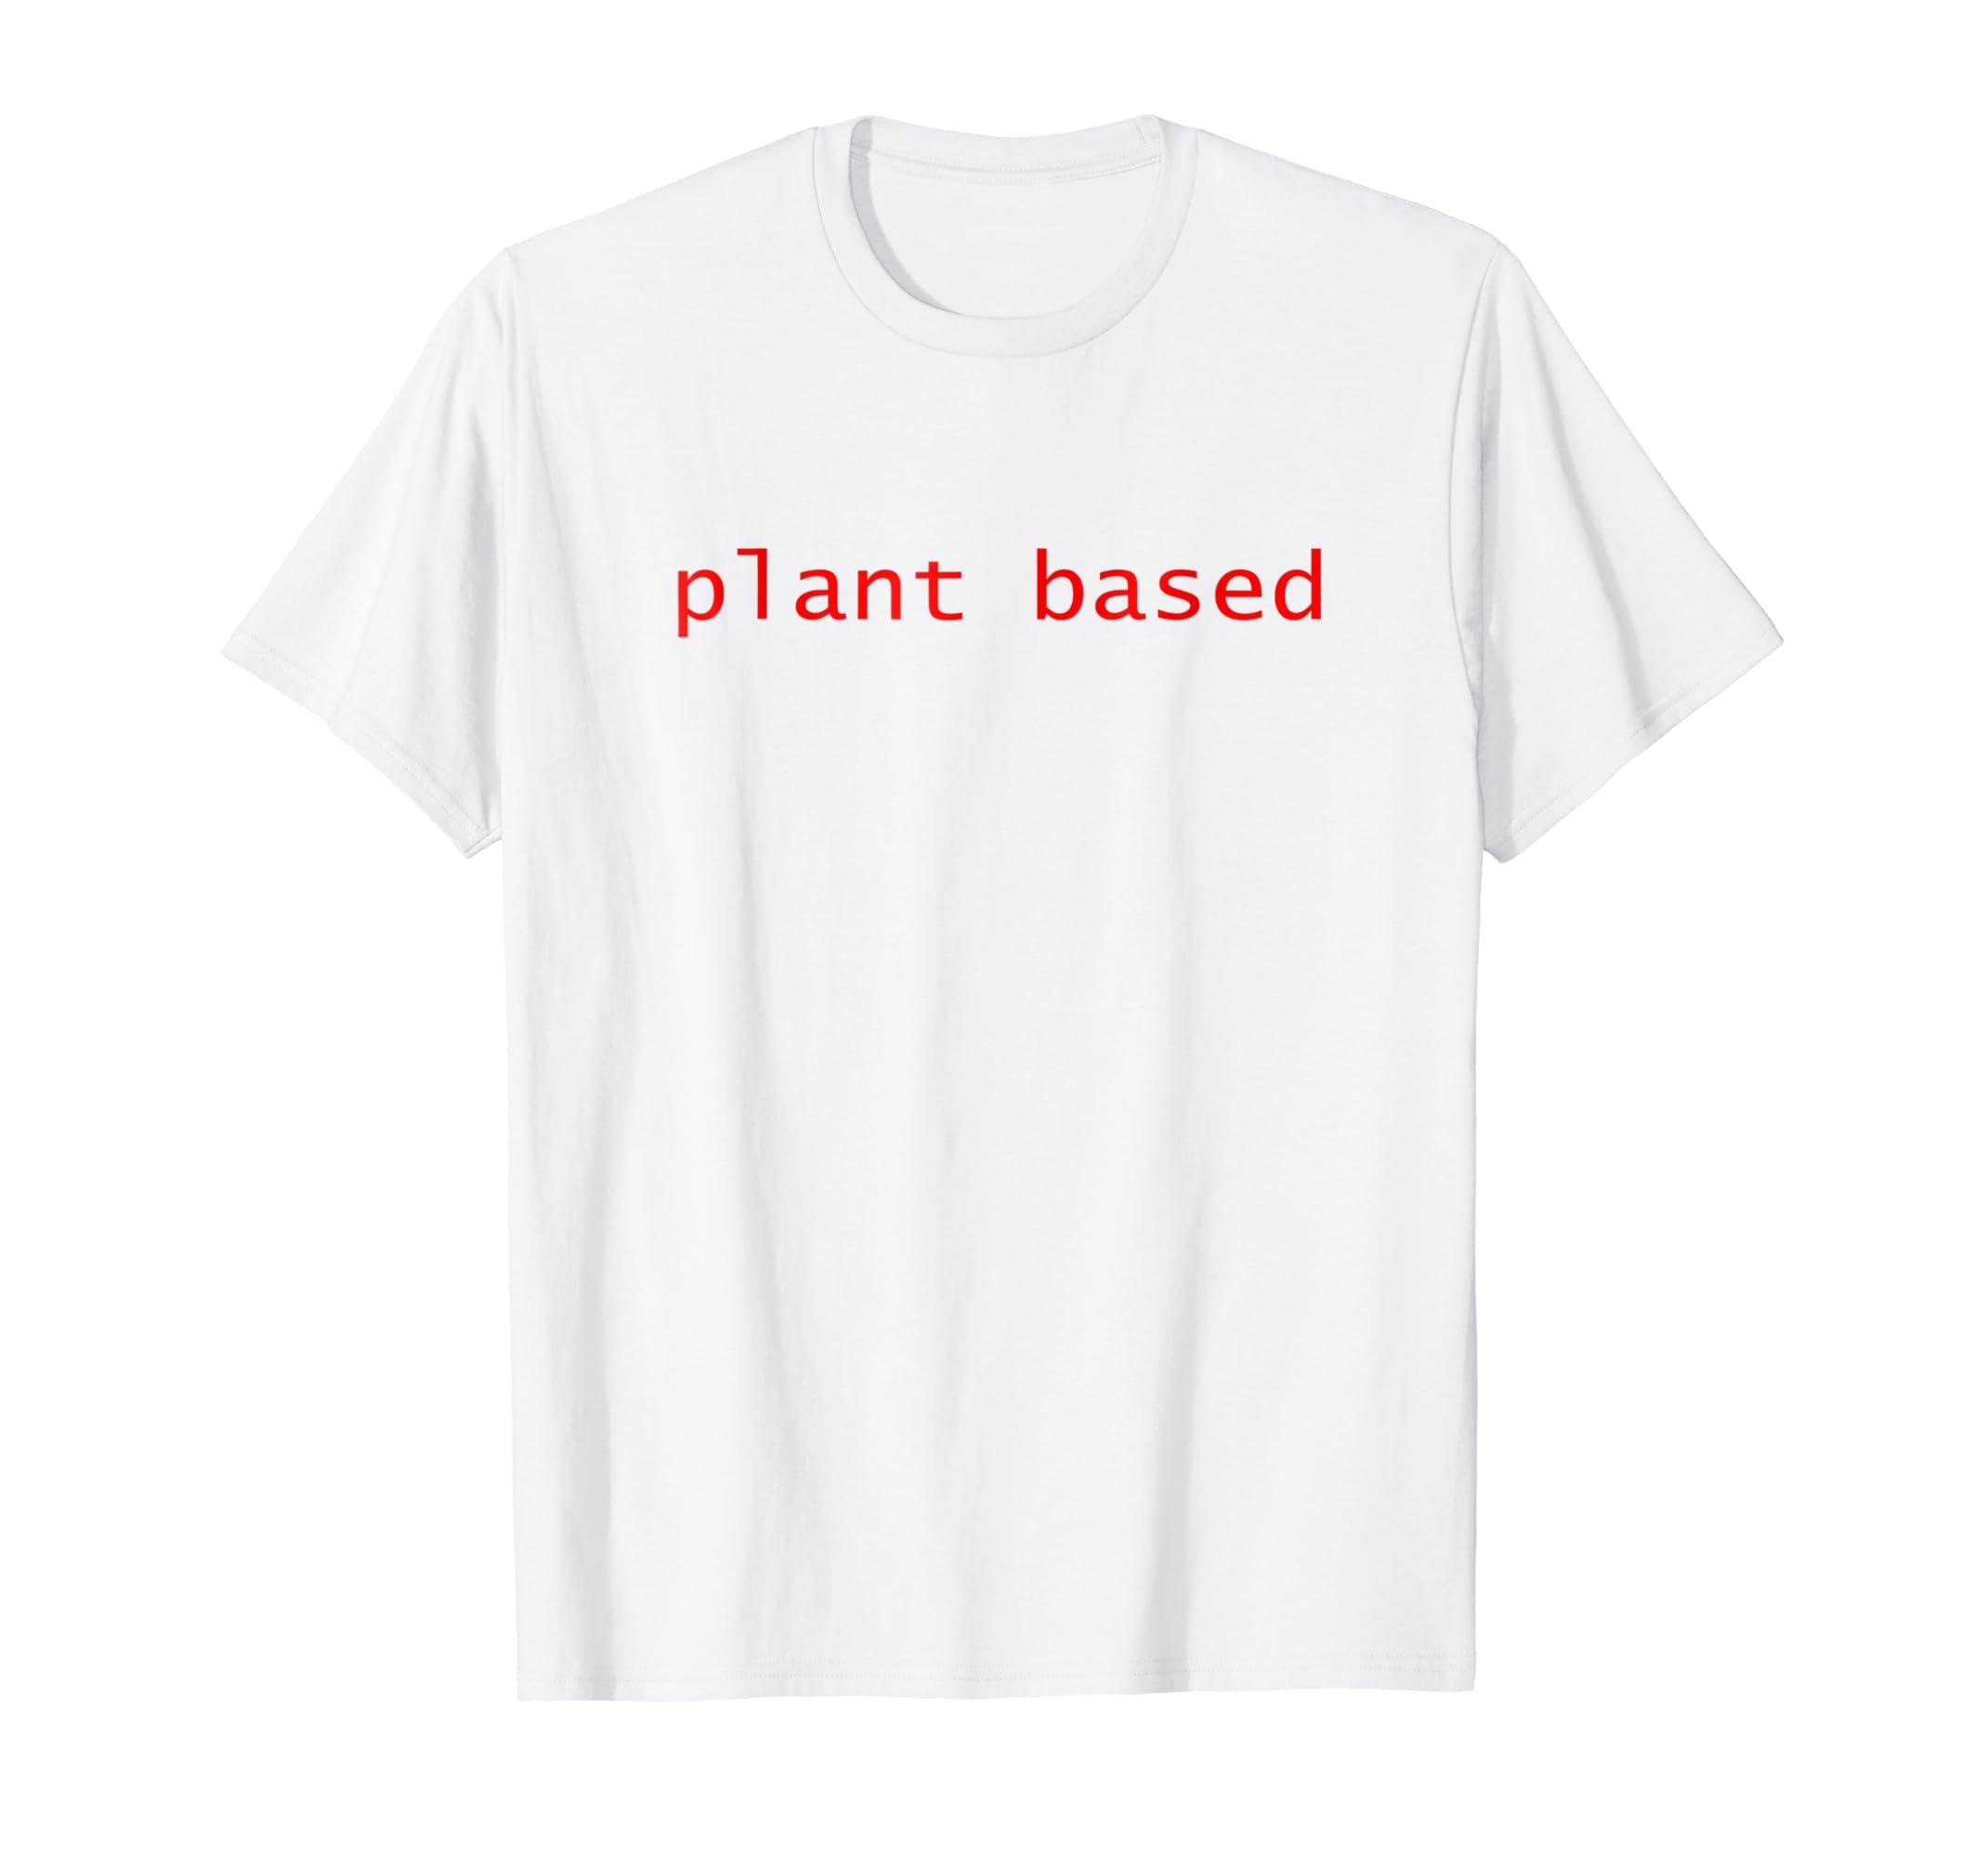 Amazon Plant Based Vegan TShirts Vegetarian Funny Birthday Gifts Clothing